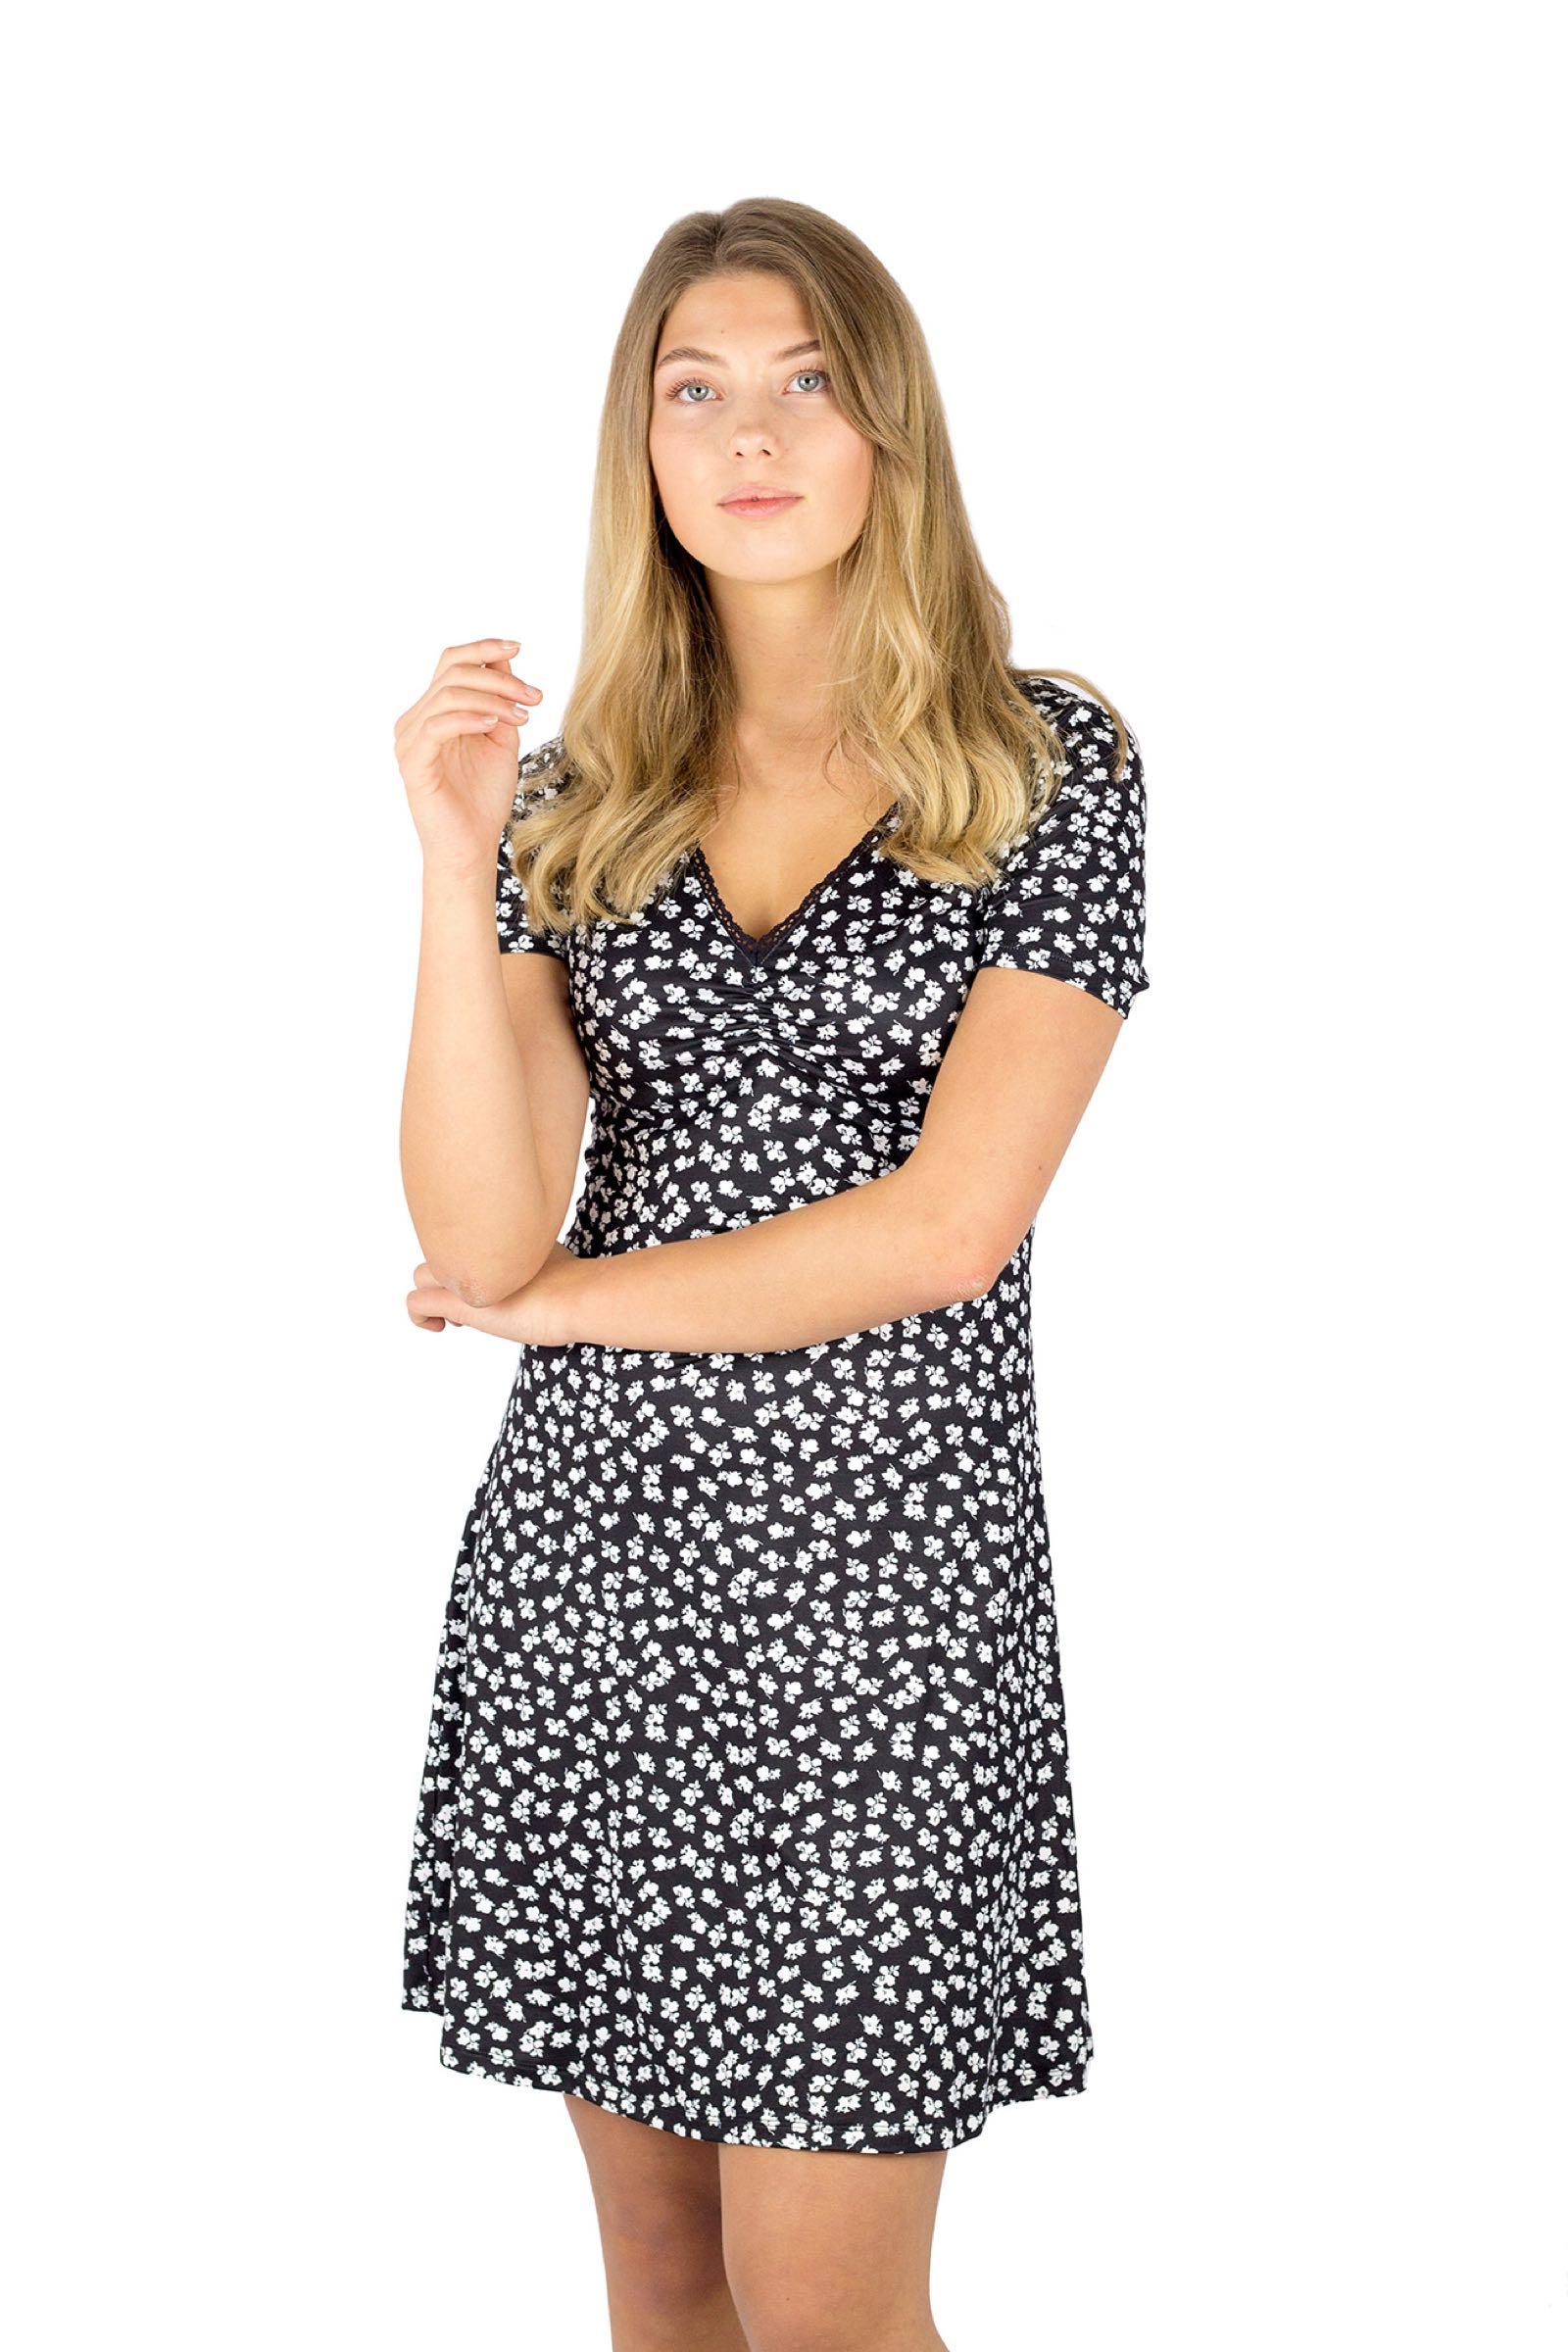 Juliette. Dress, black/white